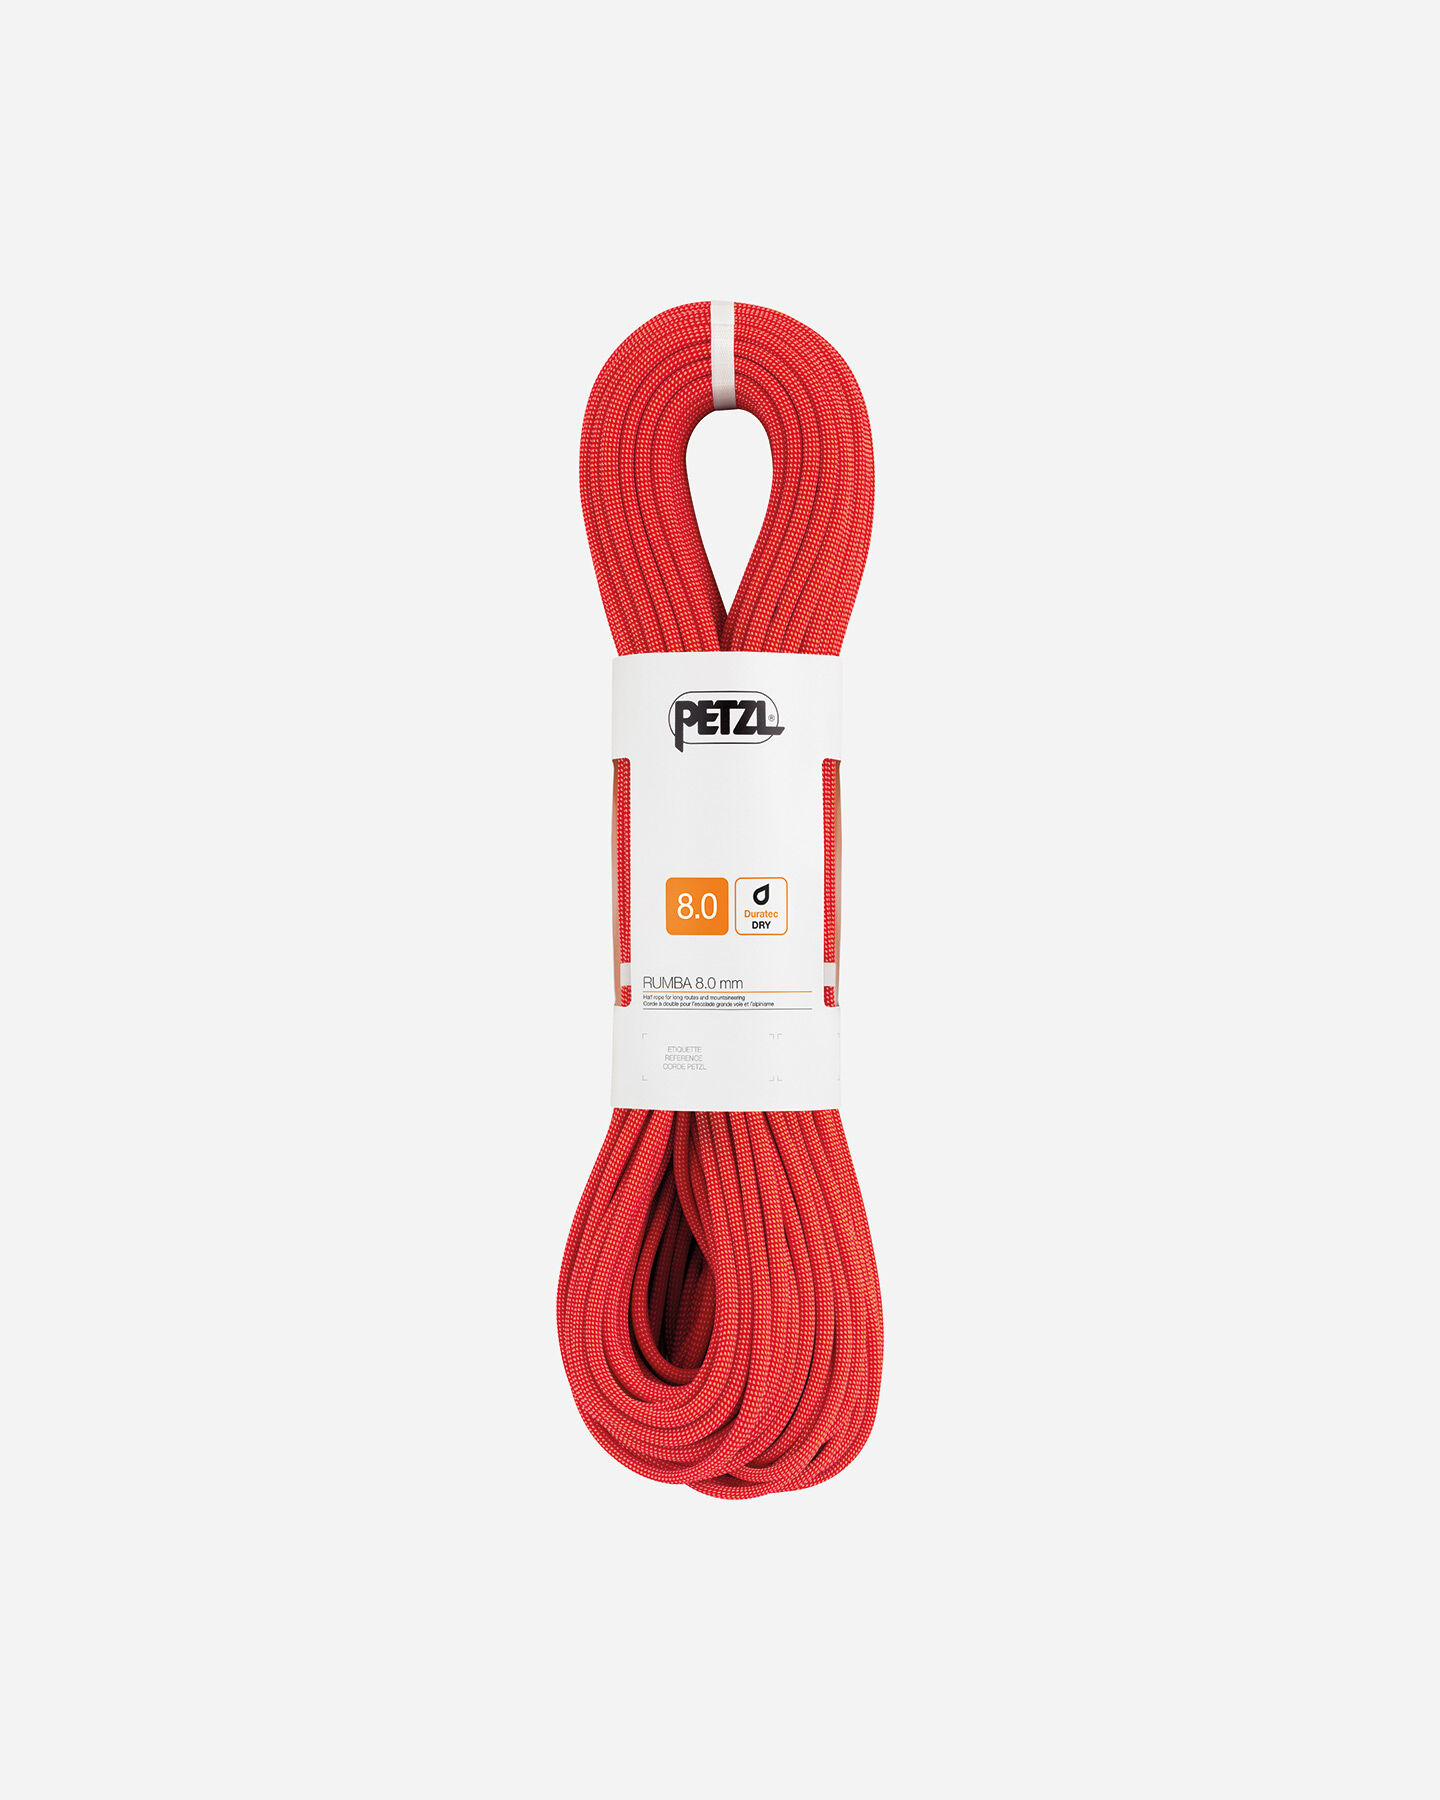 Corda PETZL CORDA PETZL RUMBA 8MM X 60MT R21BR S4014052 scatto 0